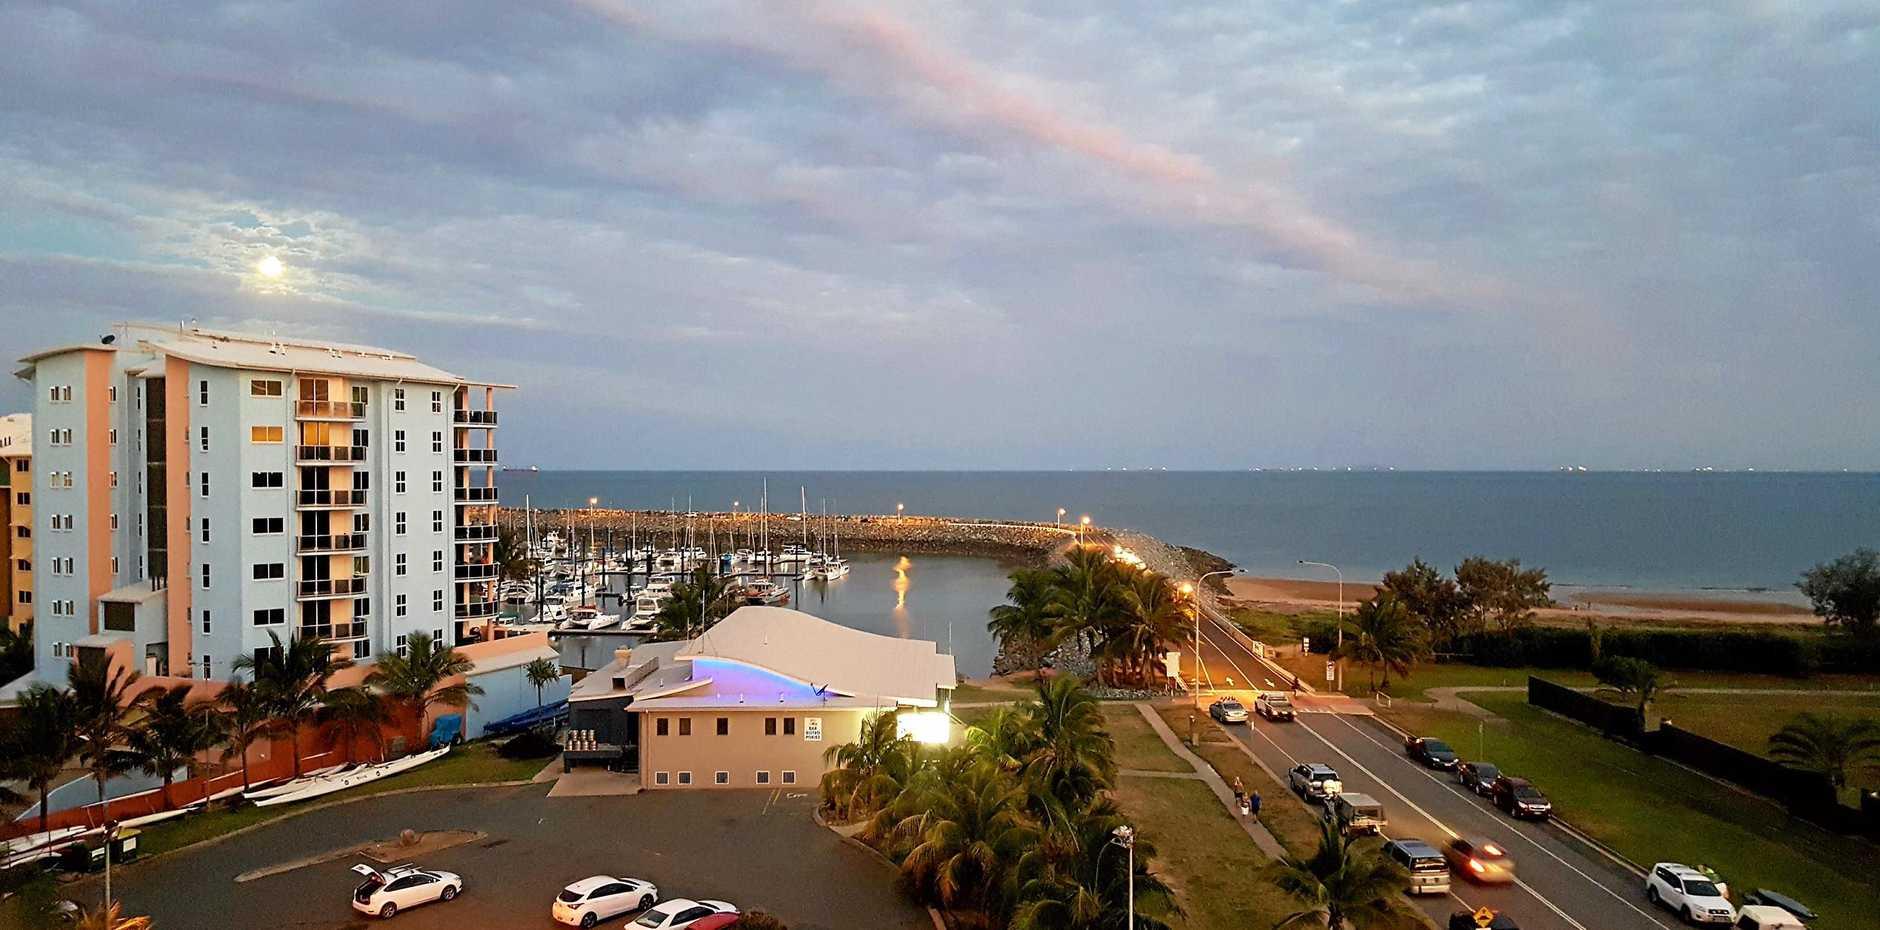 Mackay Harbour marina, southern breakwater and the Breakwater Bar and Restaurant.